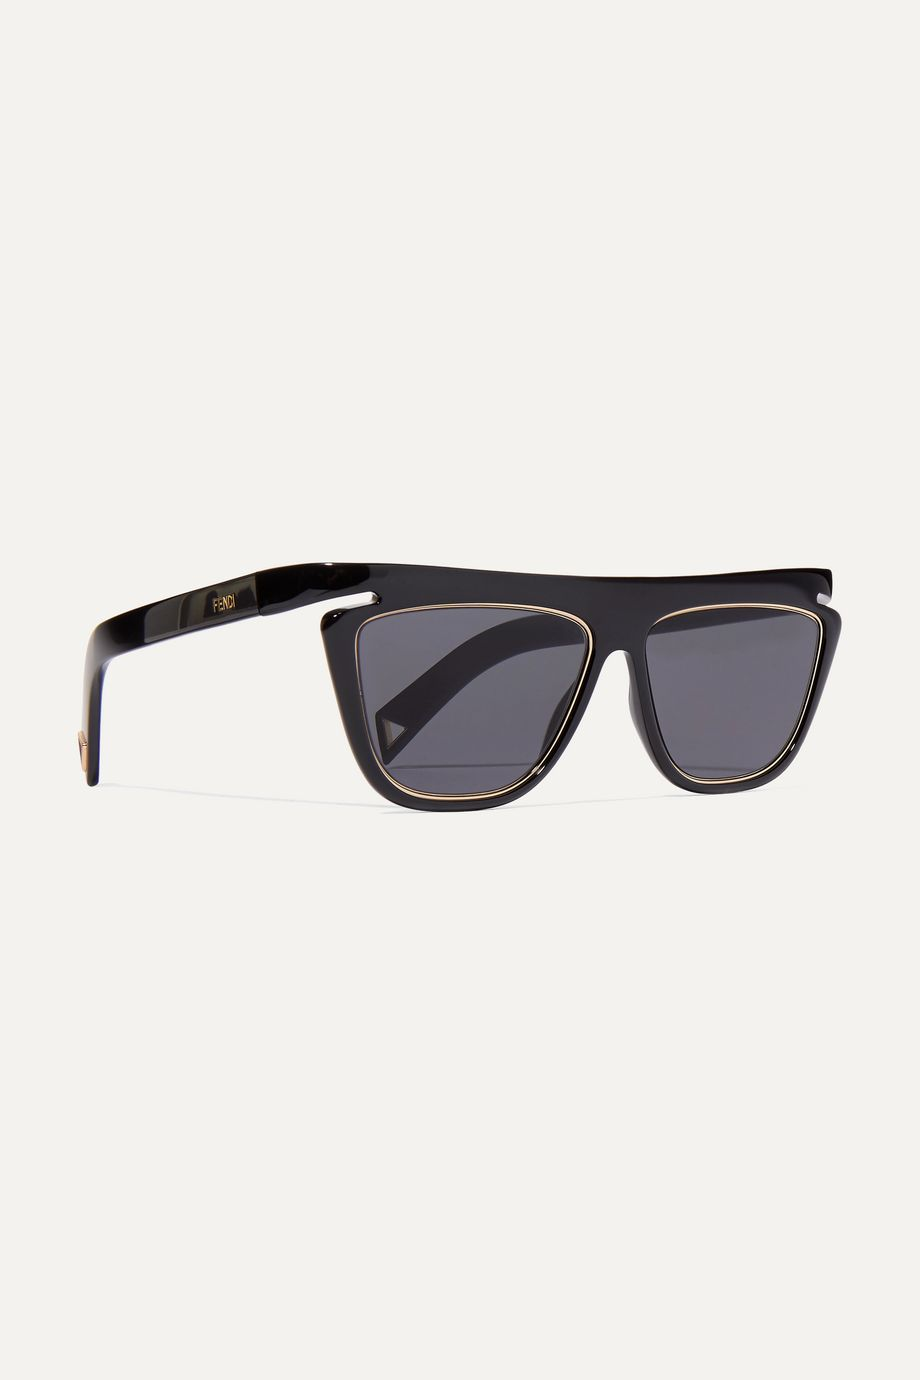 Fendi D-frame acetate and gold-tone sunglasses